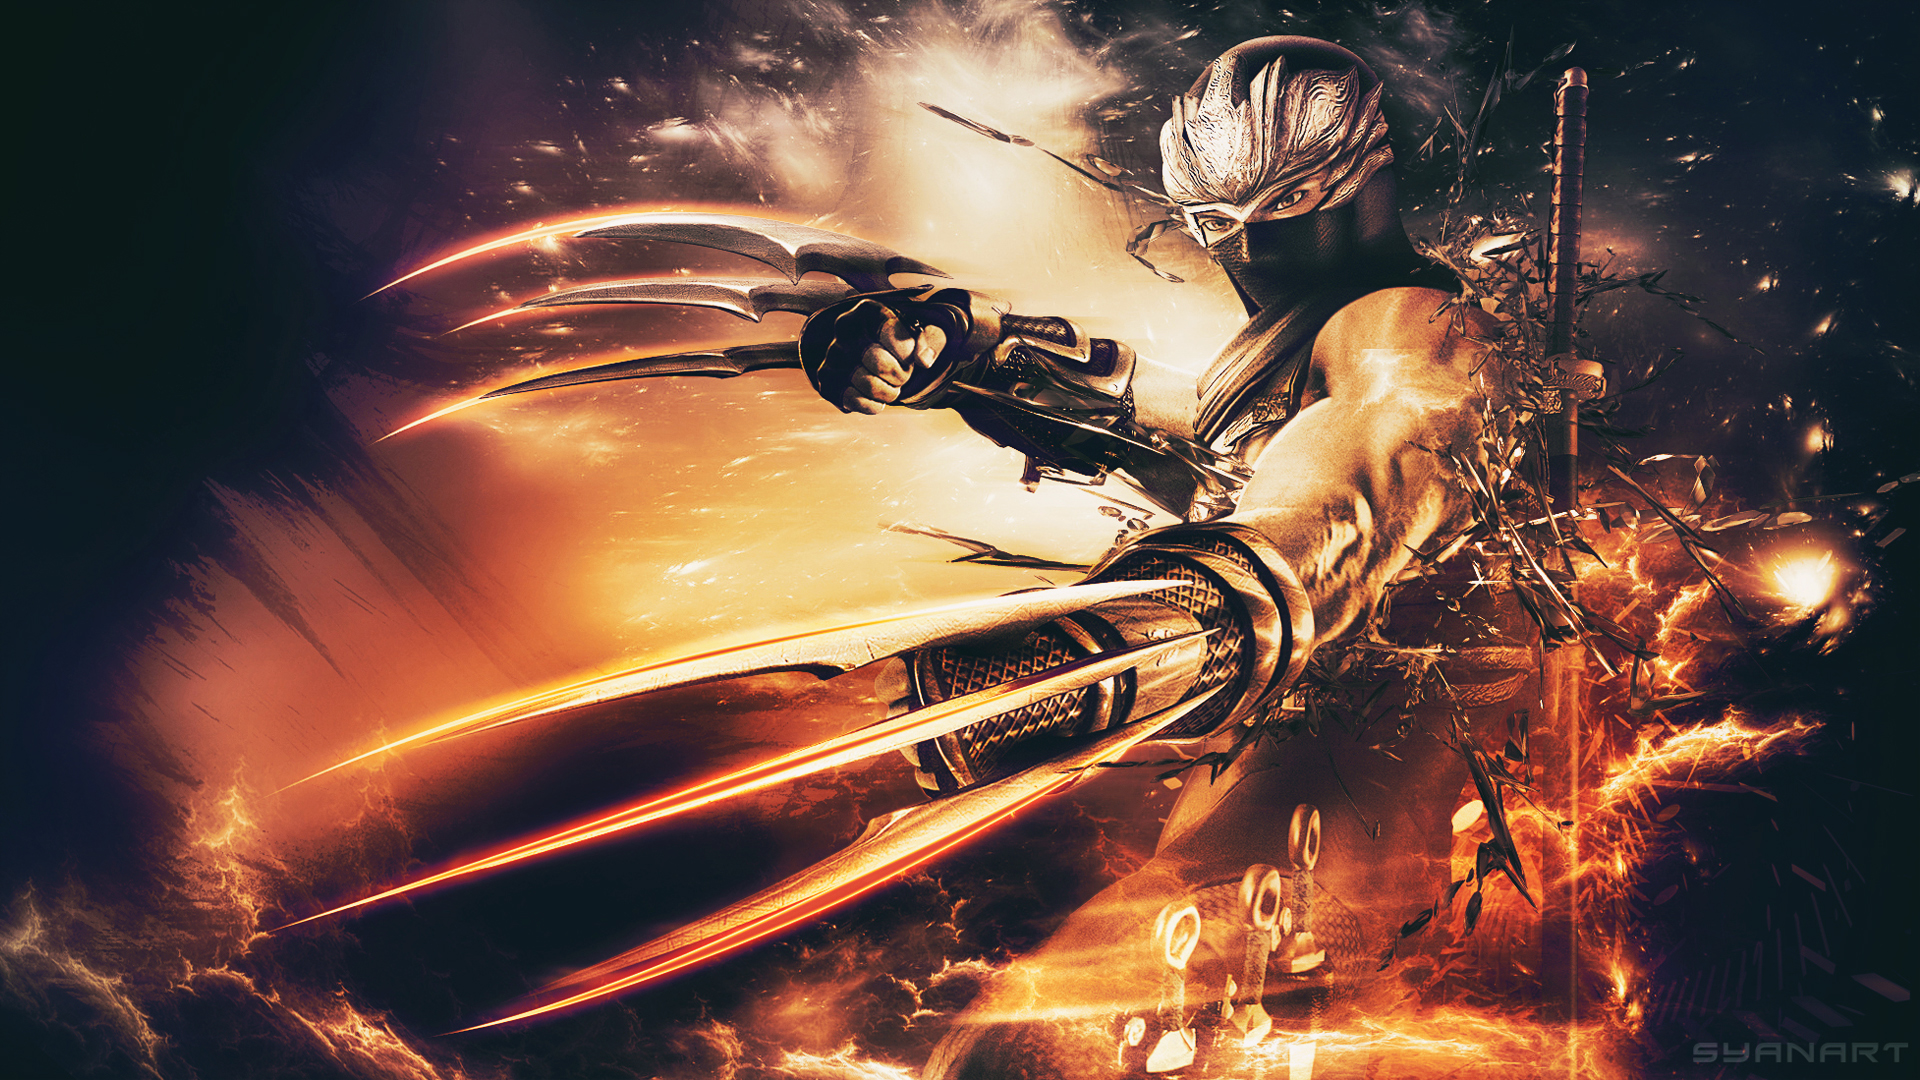 ninja gaiden sigma ii - hd wallpaper - syanart exclusive gaming